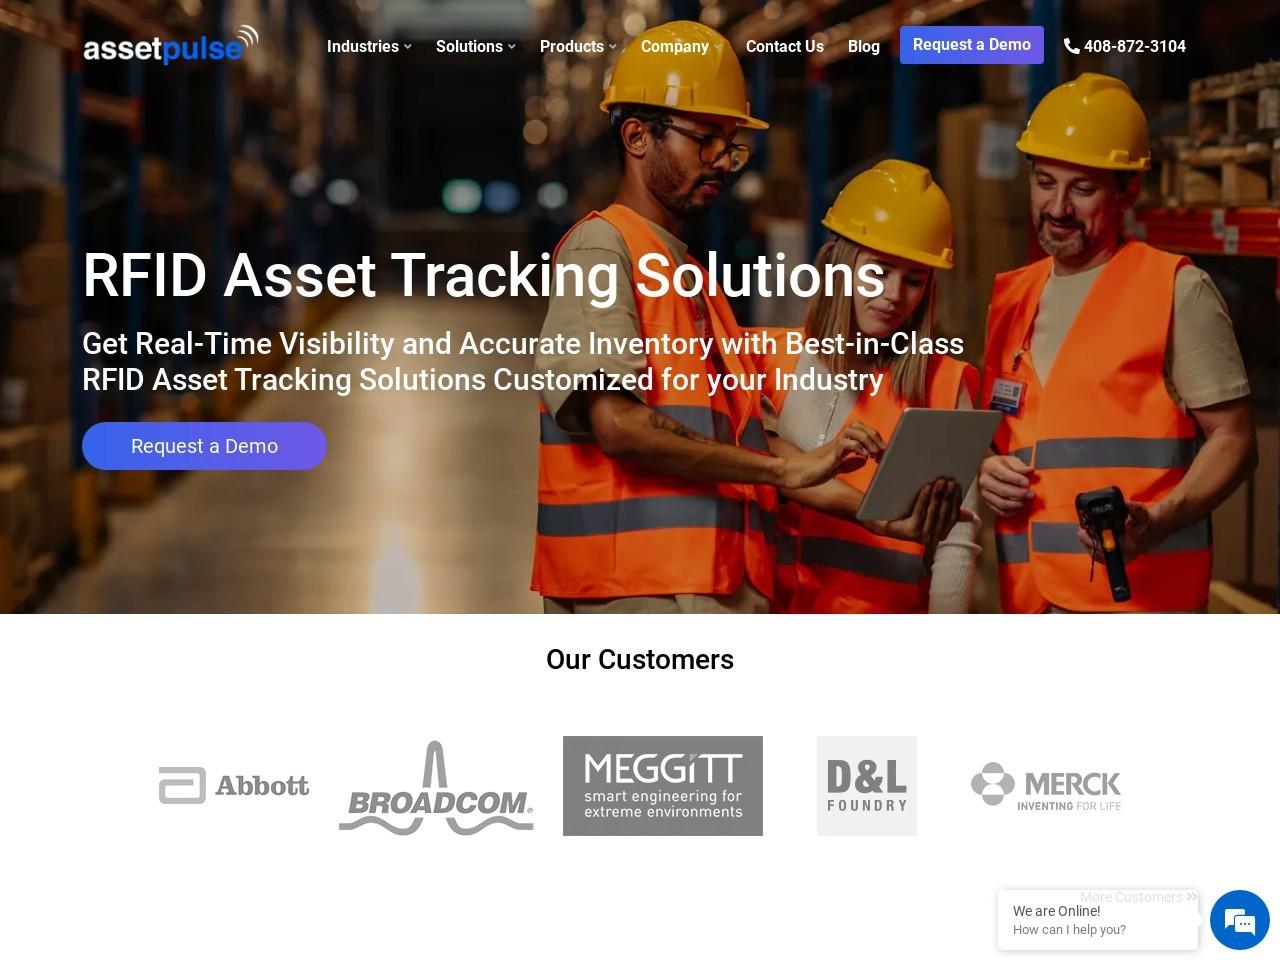 RFID Laboratory Equipment Tracking Software